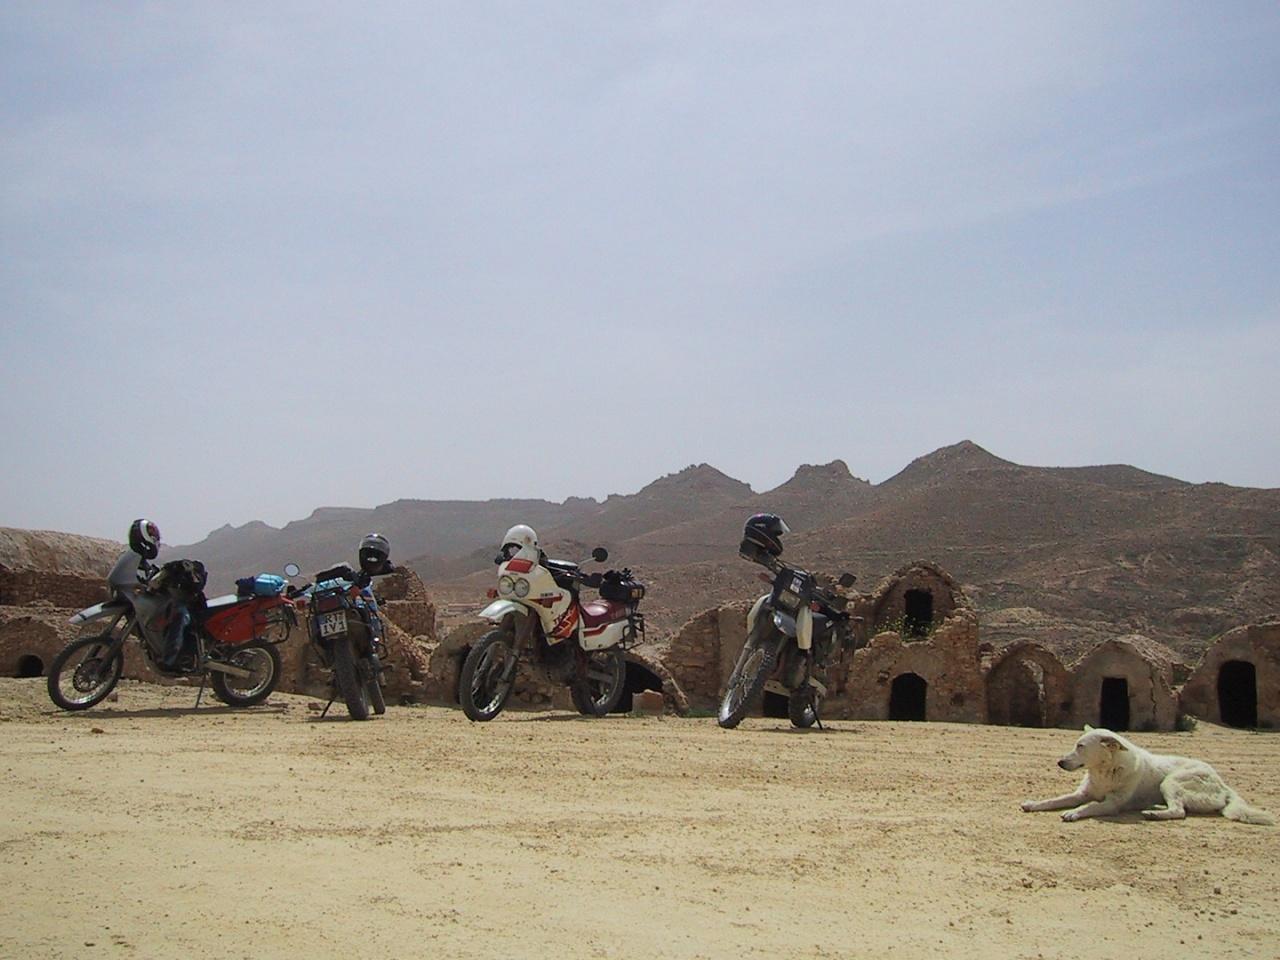 20030415_1214-Mopeds_in_Ksar_Halouf